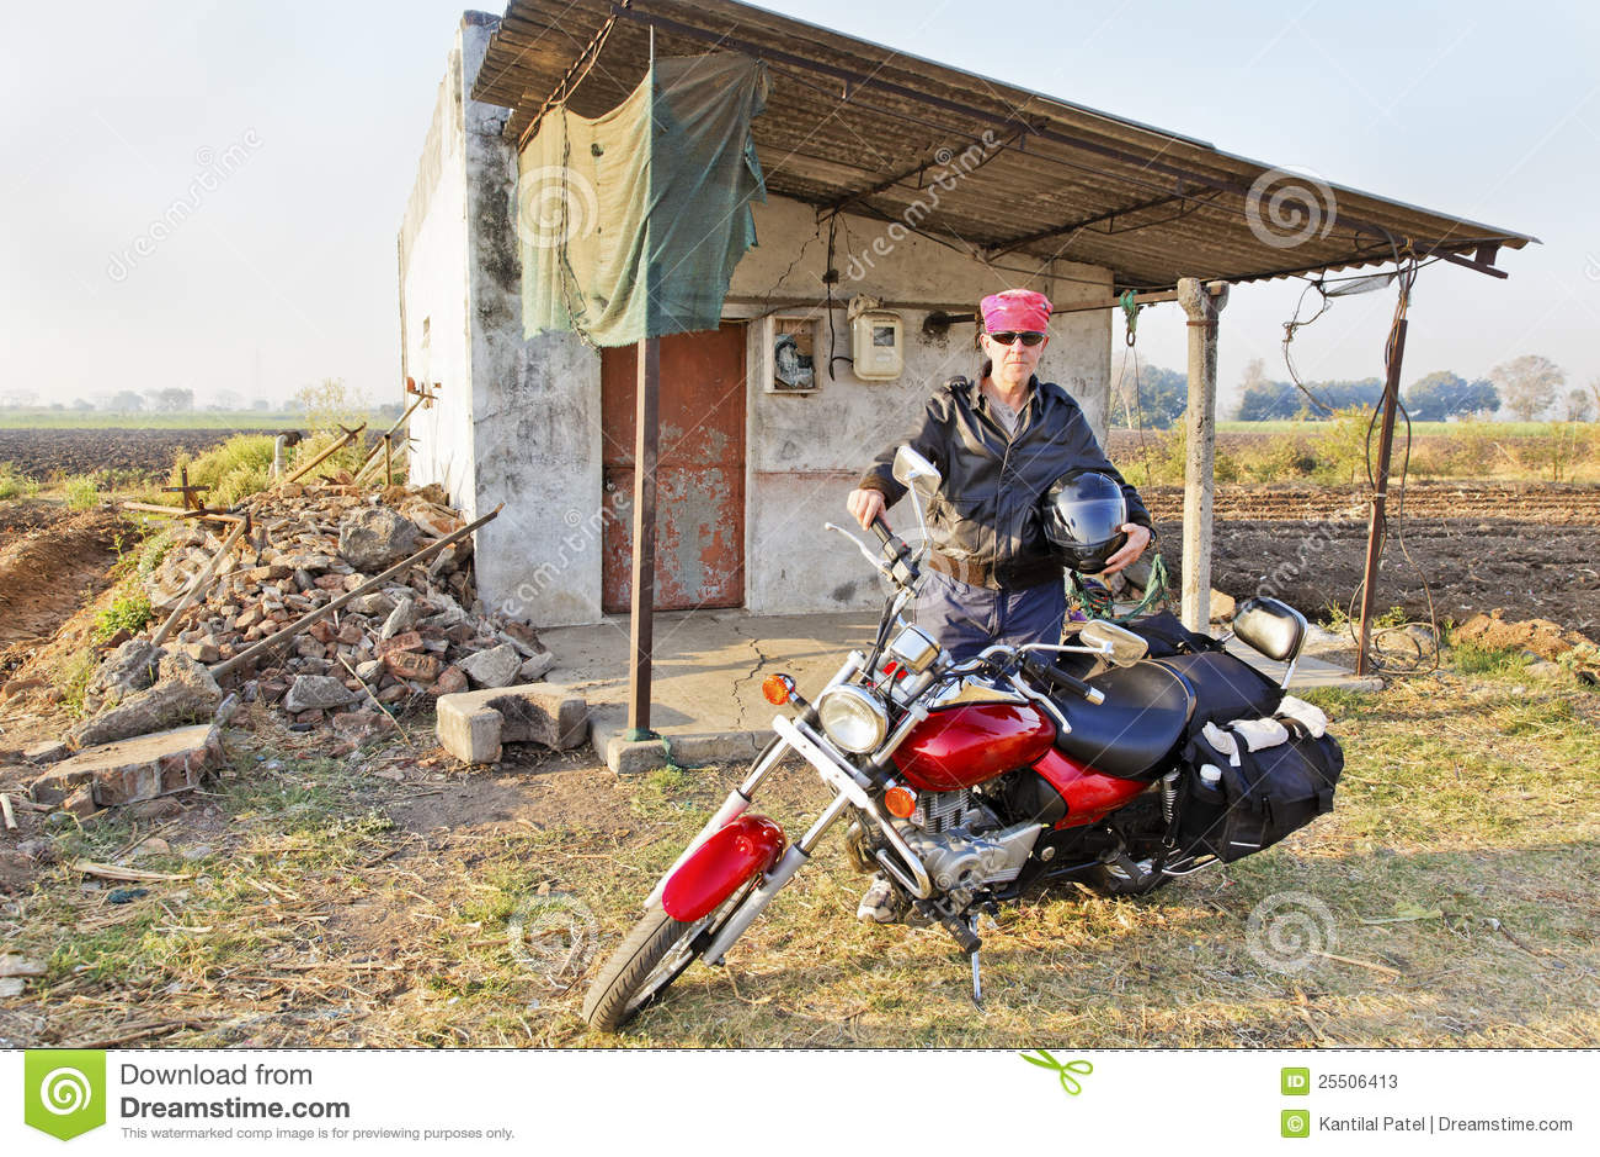 Caucasian Biker outside country shack